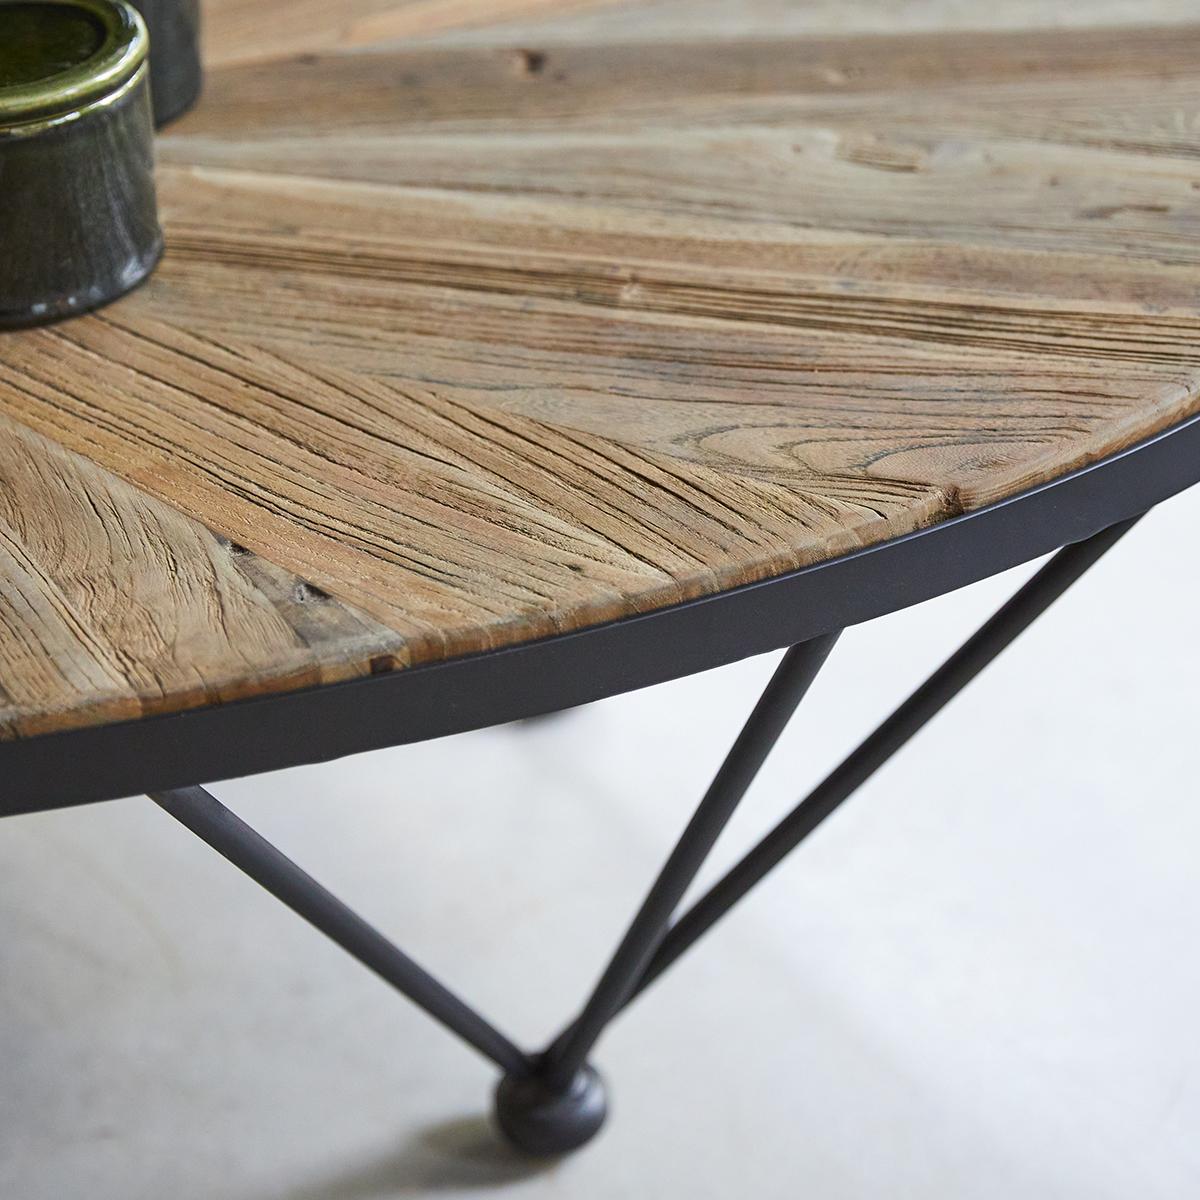 Lancelot Elm and Metal Coffee Table 7x7